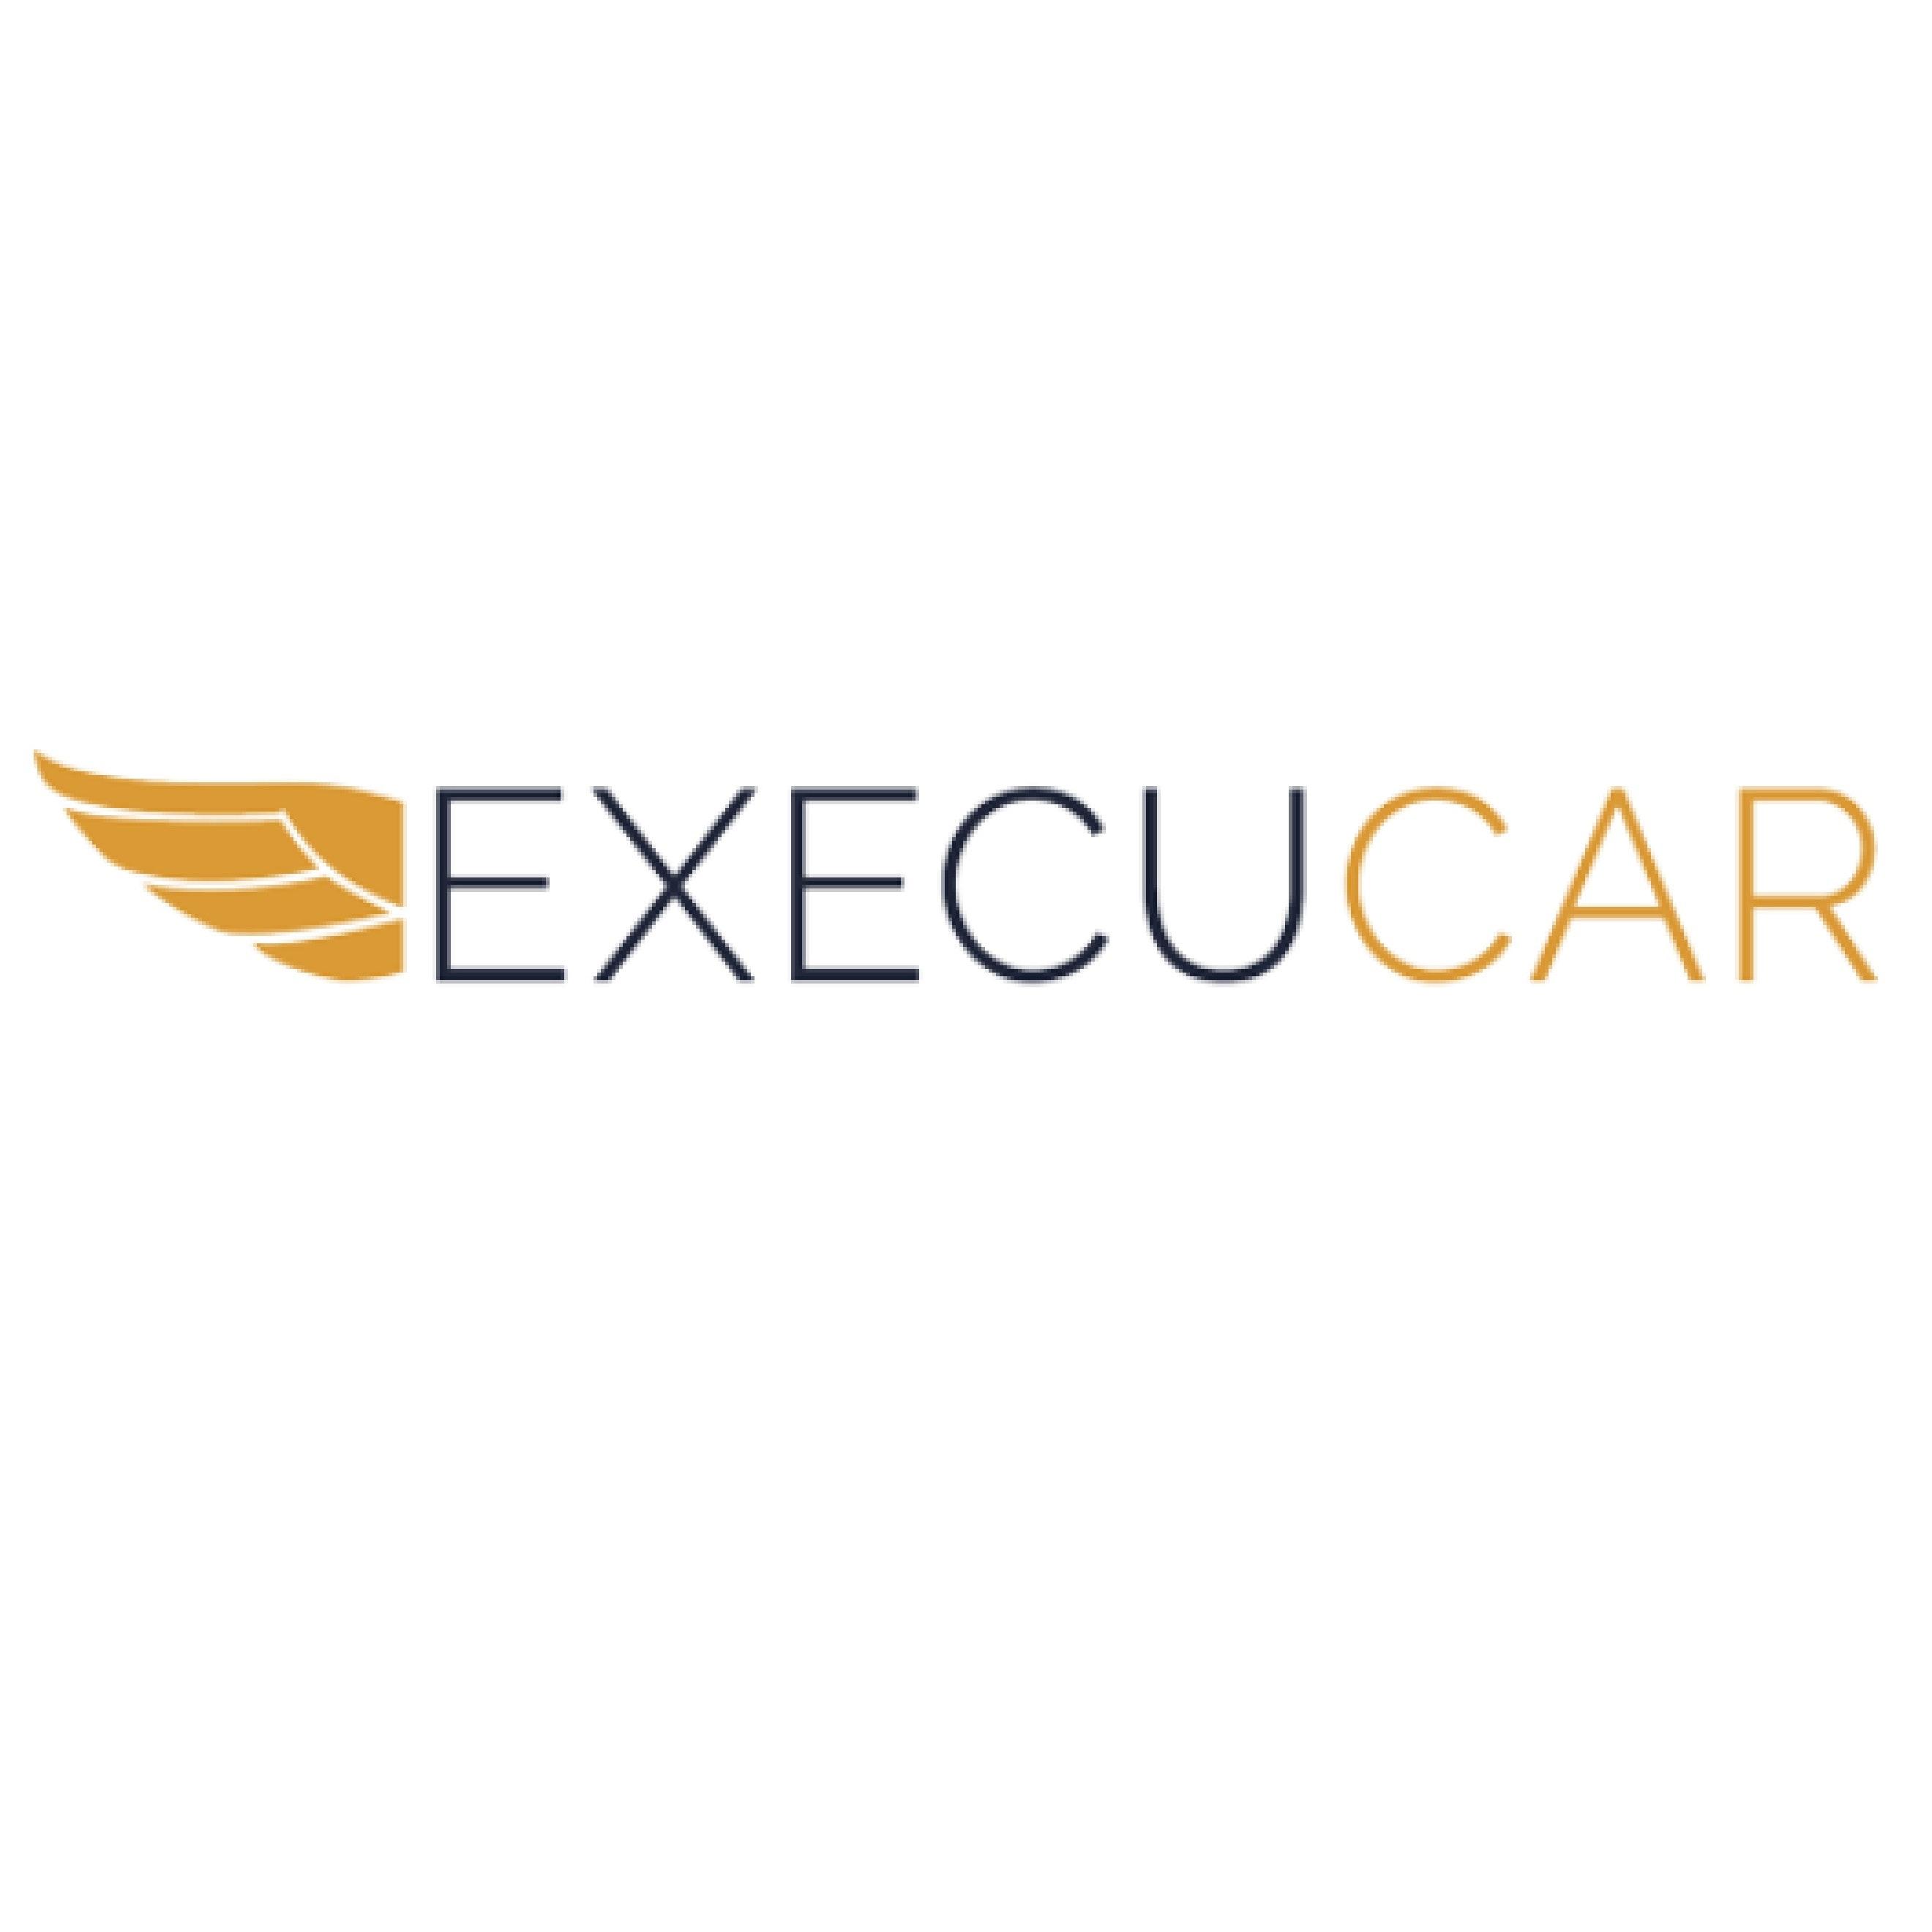 Execucar - Premium SUV, Curbside